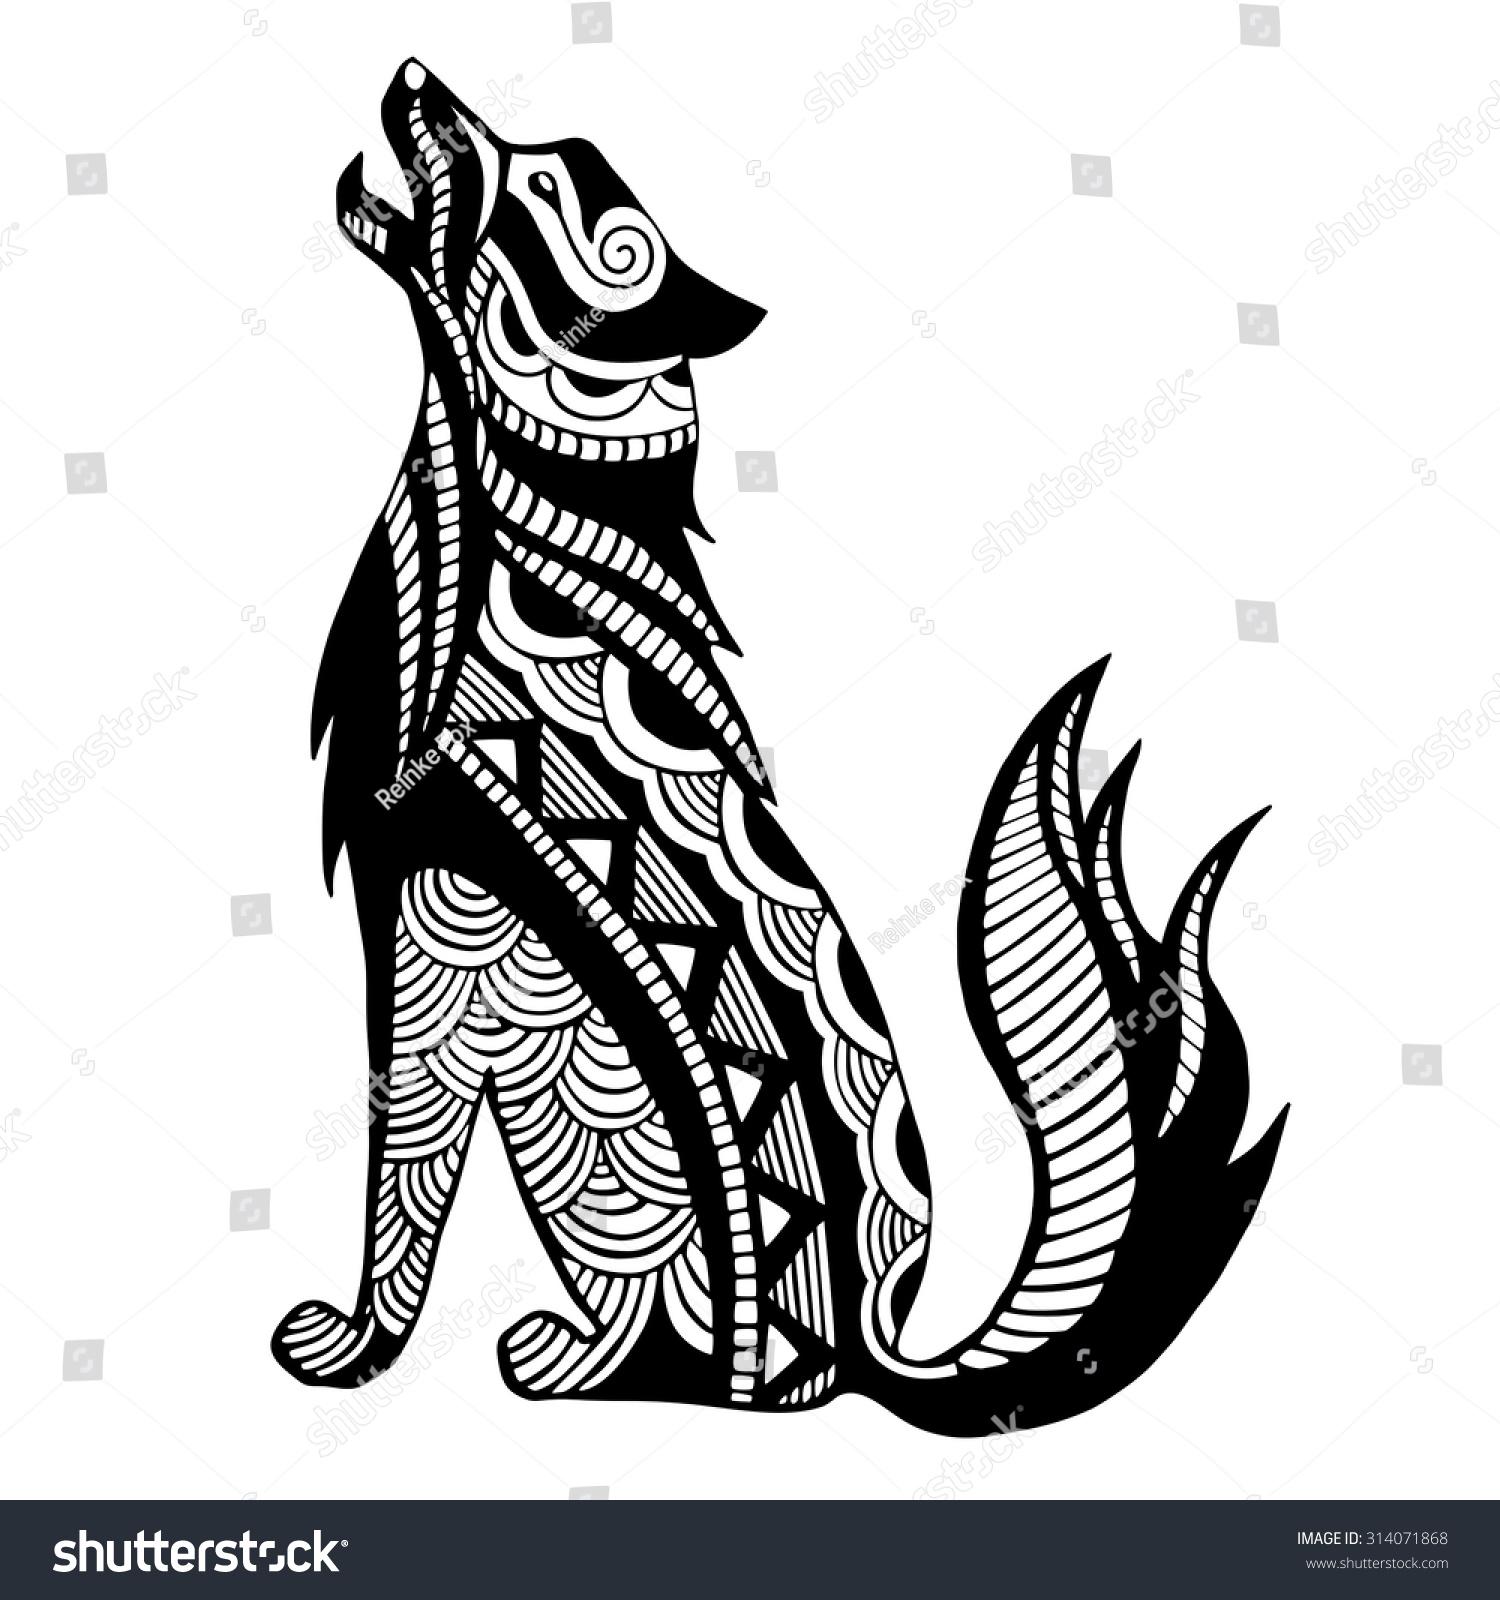 ethnic black wolf silhouette african totem stock vector 314071868 shutterstock. Black Bedroom Furniture Sets. Home Design Ideas